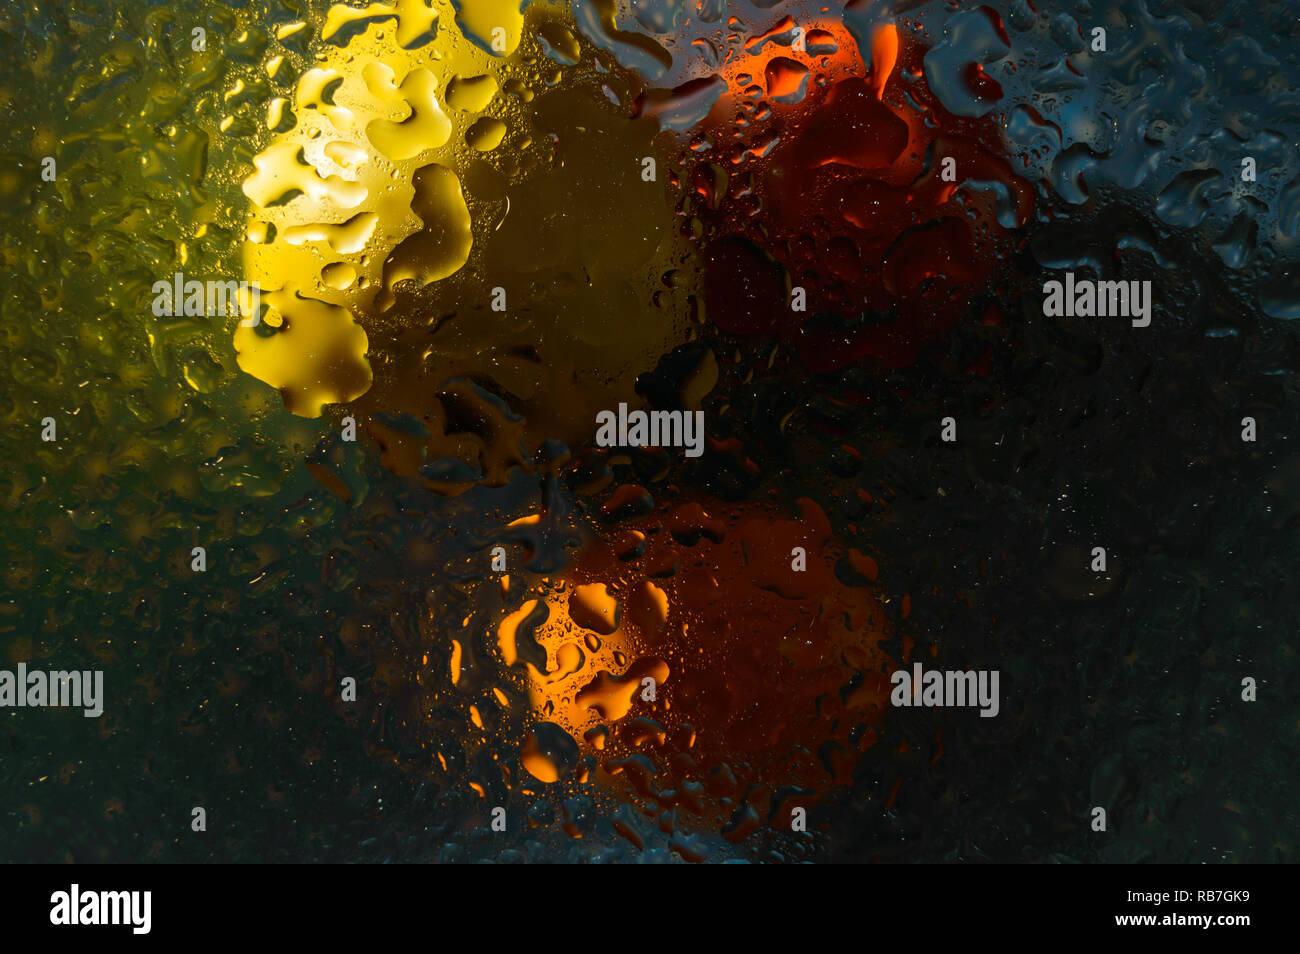 amazing water drops - Stock Image